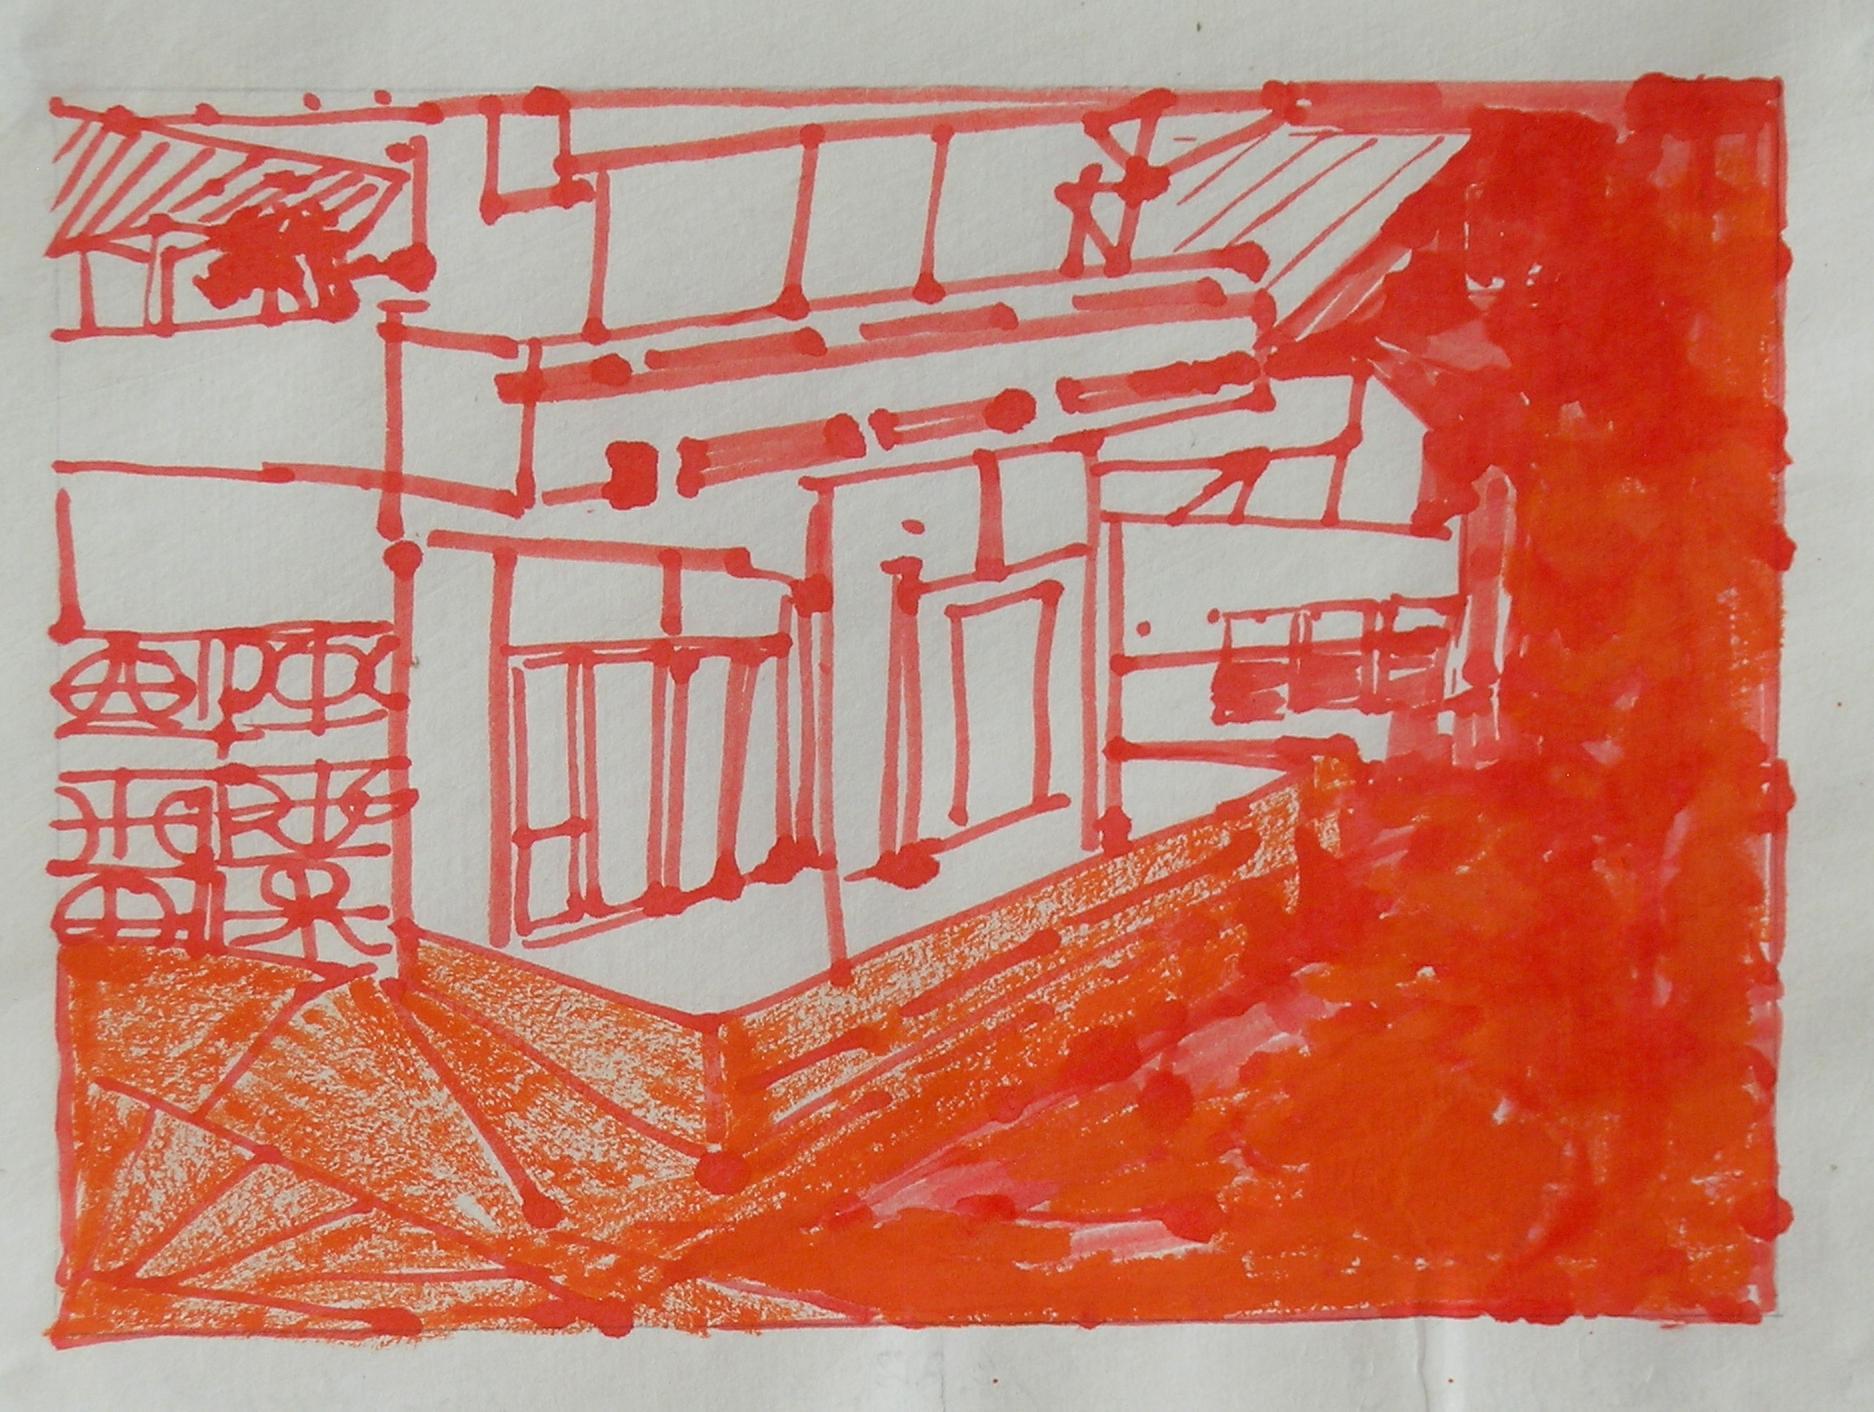 Josette Urso, Backyard 3, 2005, Ink Brush Drawing, 6 x 8 in